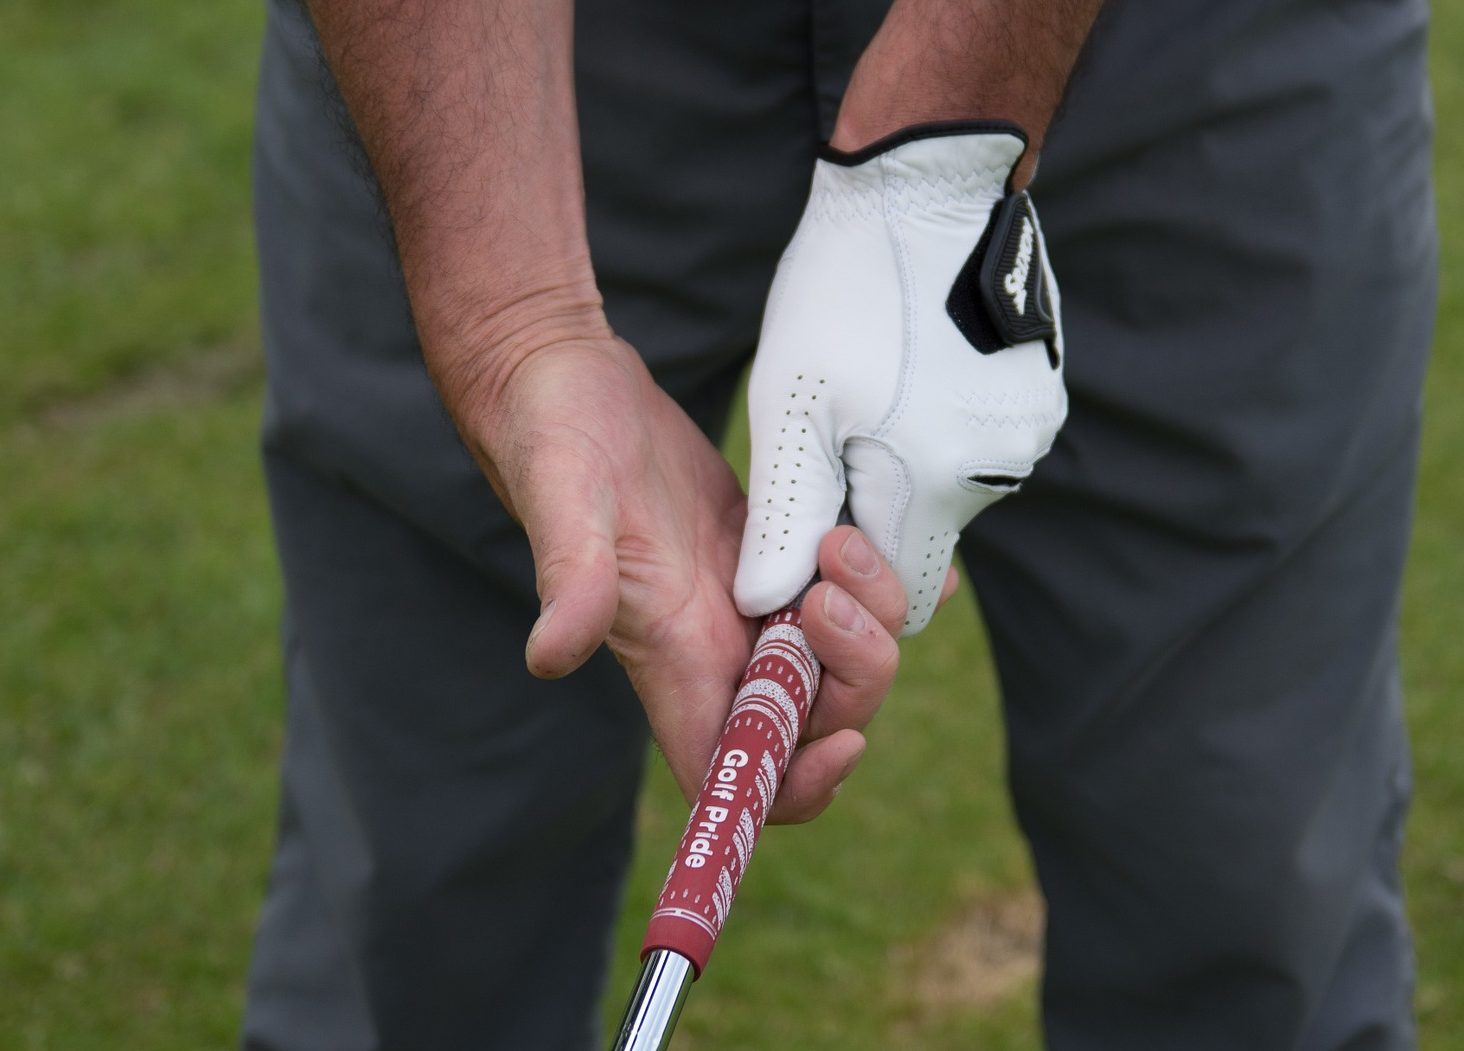 Best Way to Grip a Golf Club